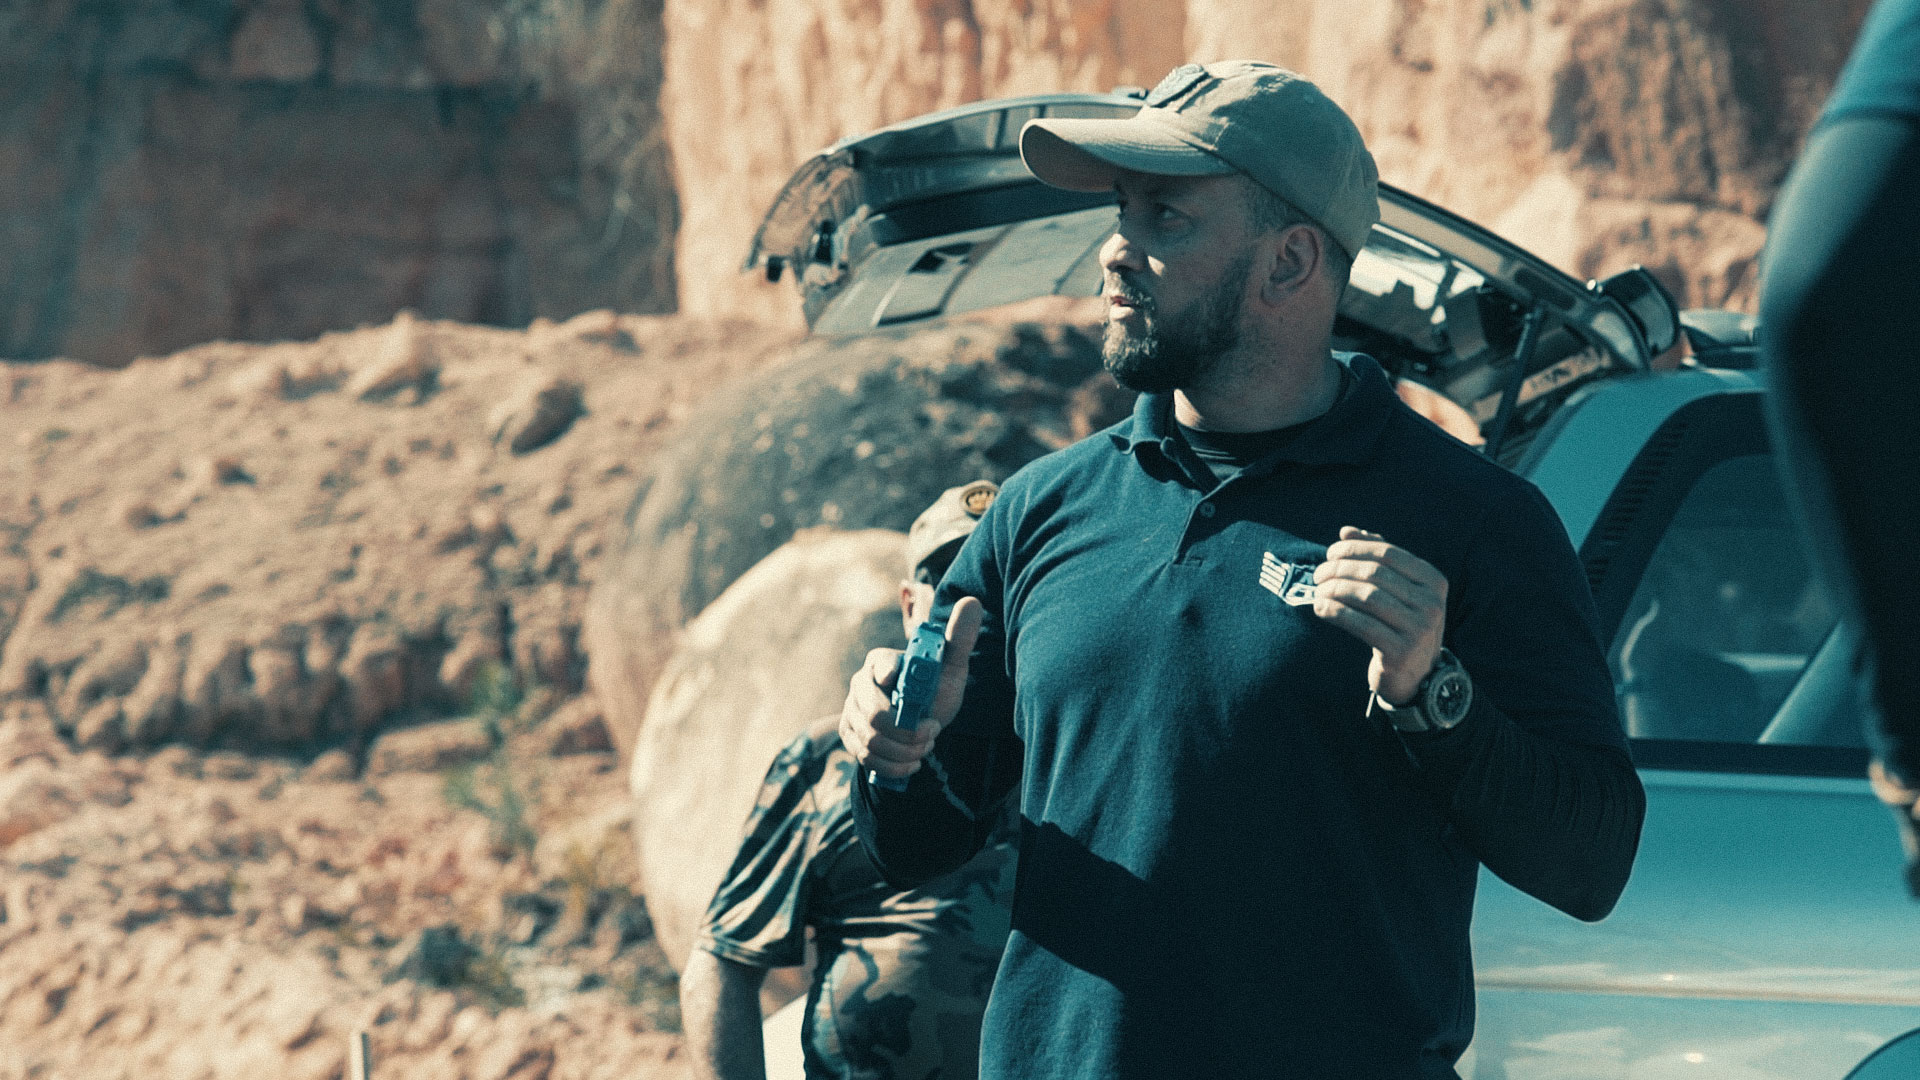 SHOT – Single Handed Operator Tactics